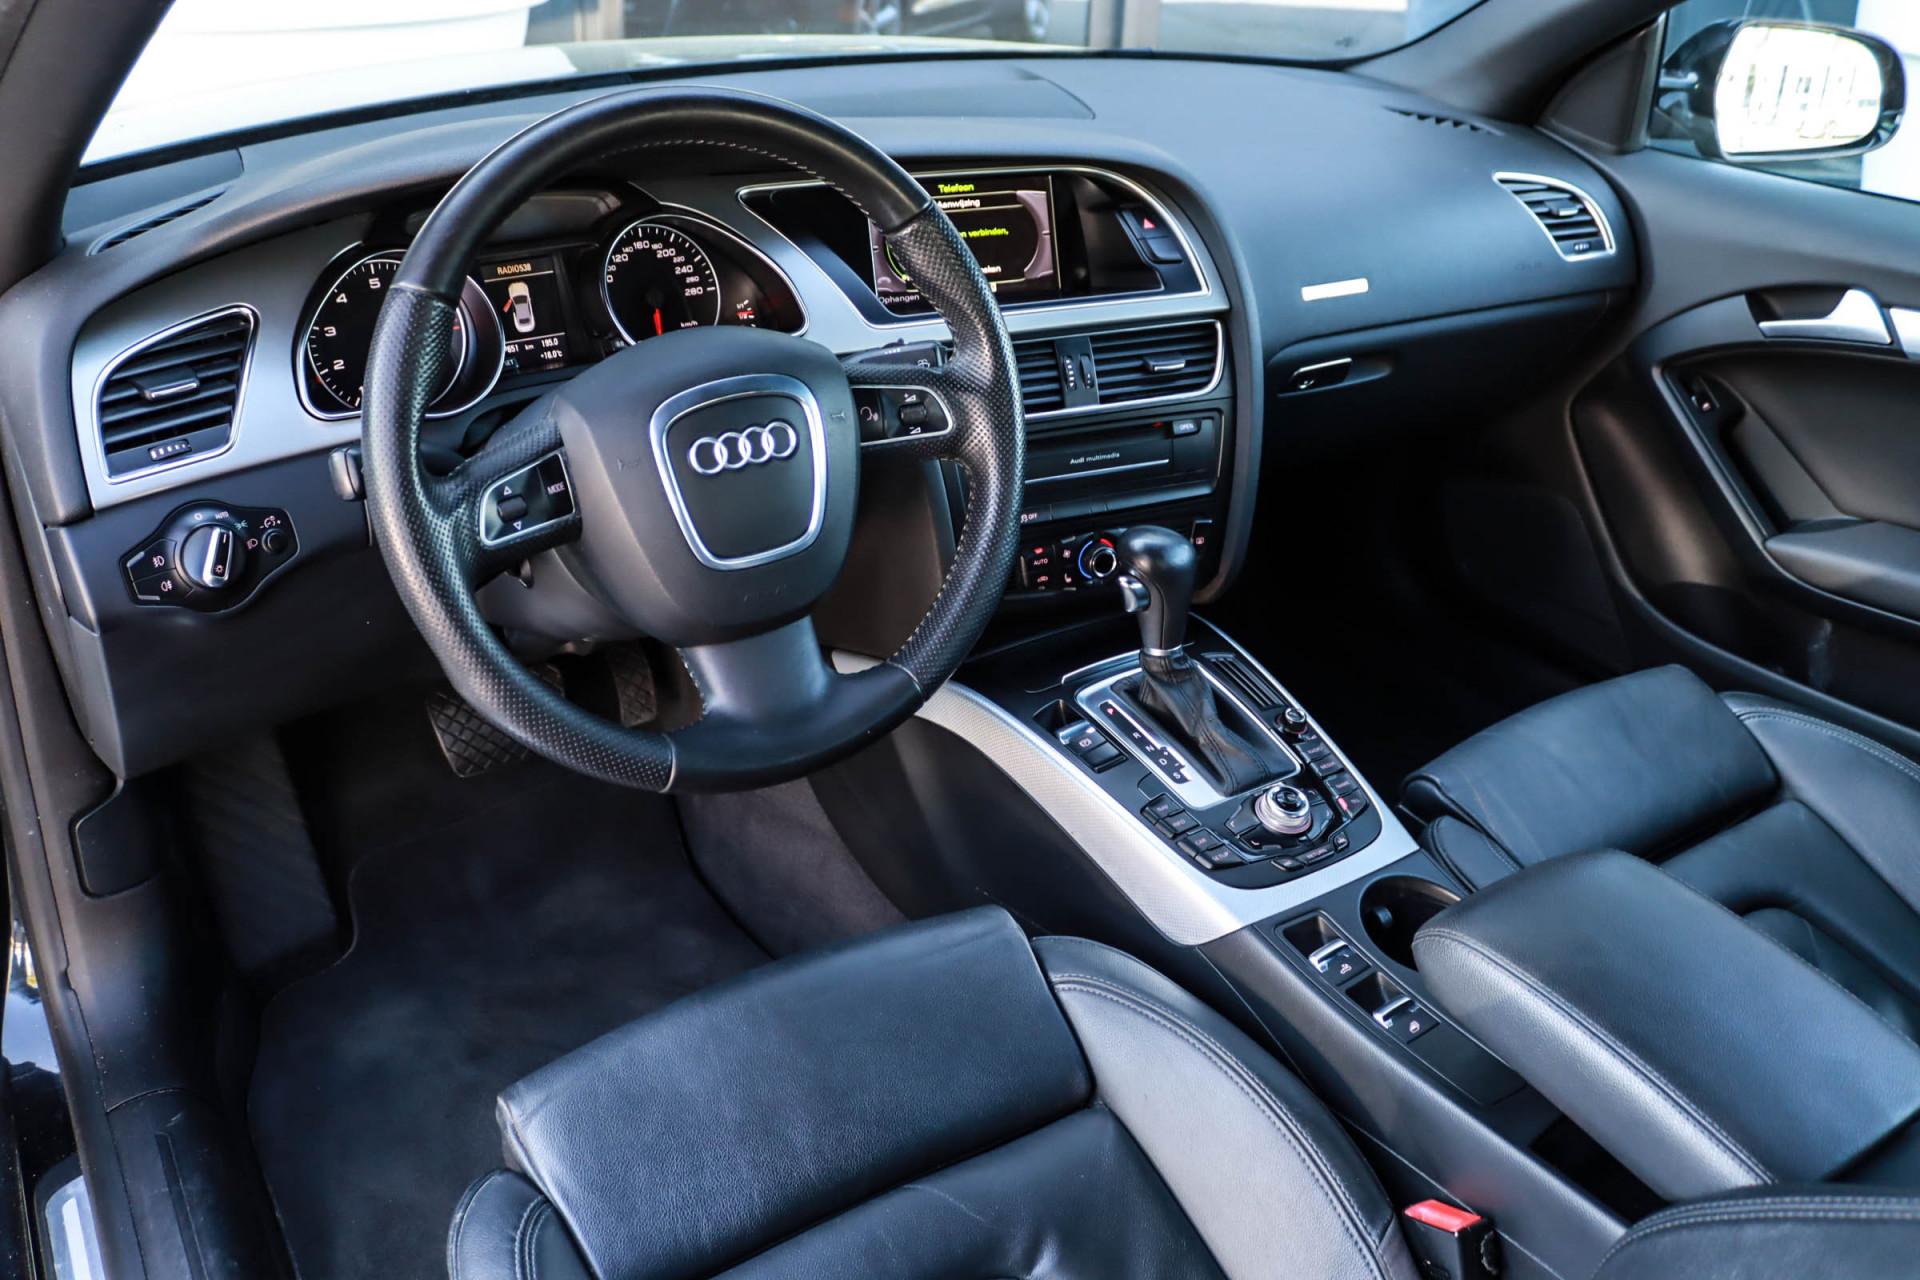 Tweedehands Audi A5 Cabriolet 2011 occasion